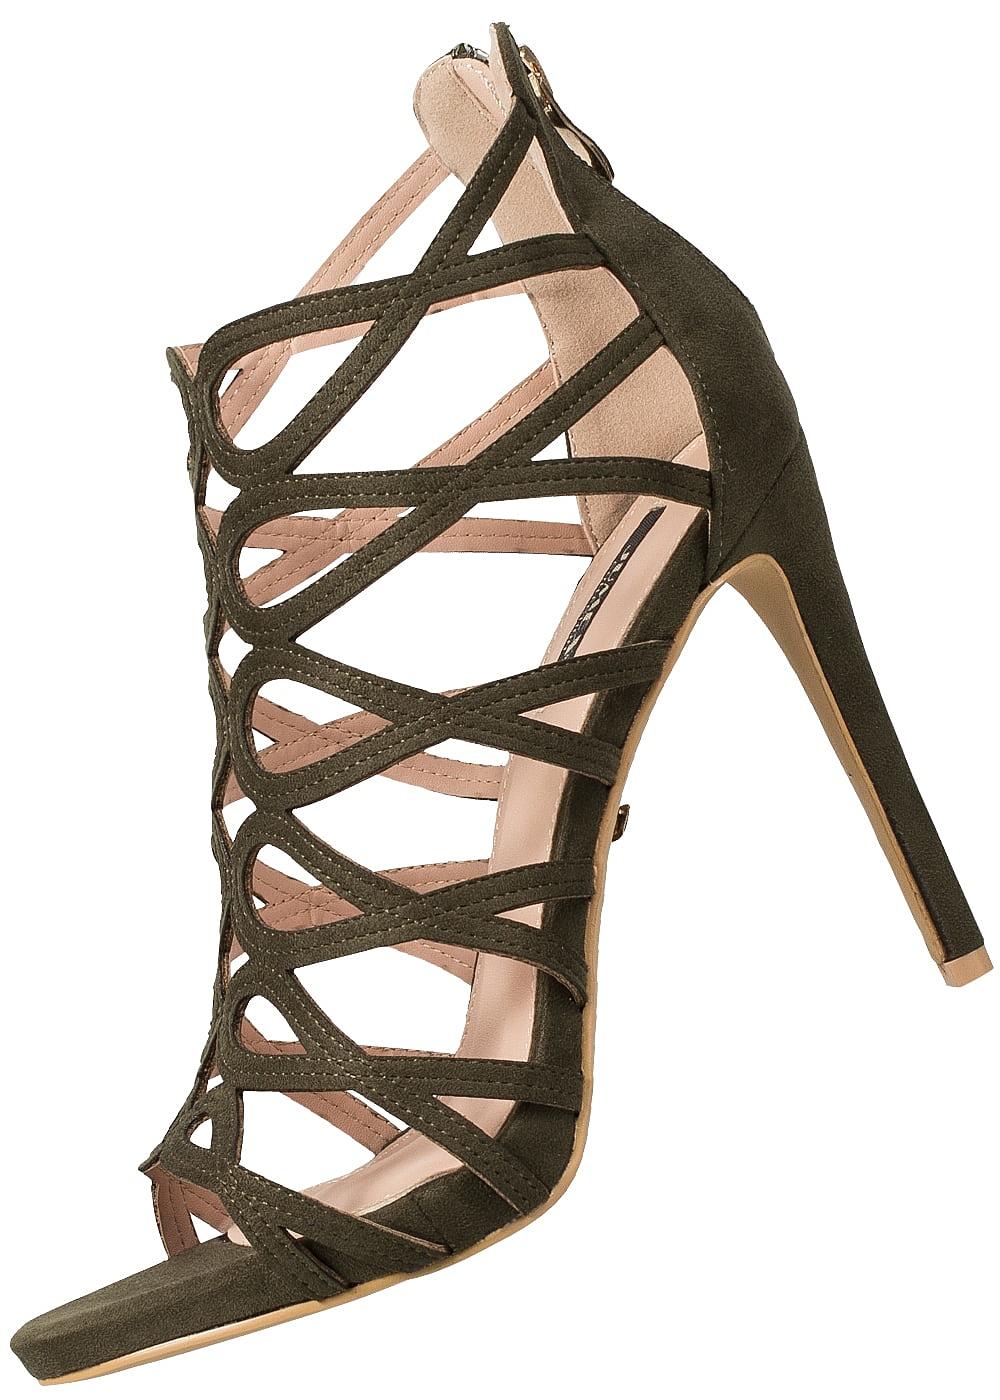 Seventyseven Lifestyle Schuh Damen Pumps Absatz 11cm Velours